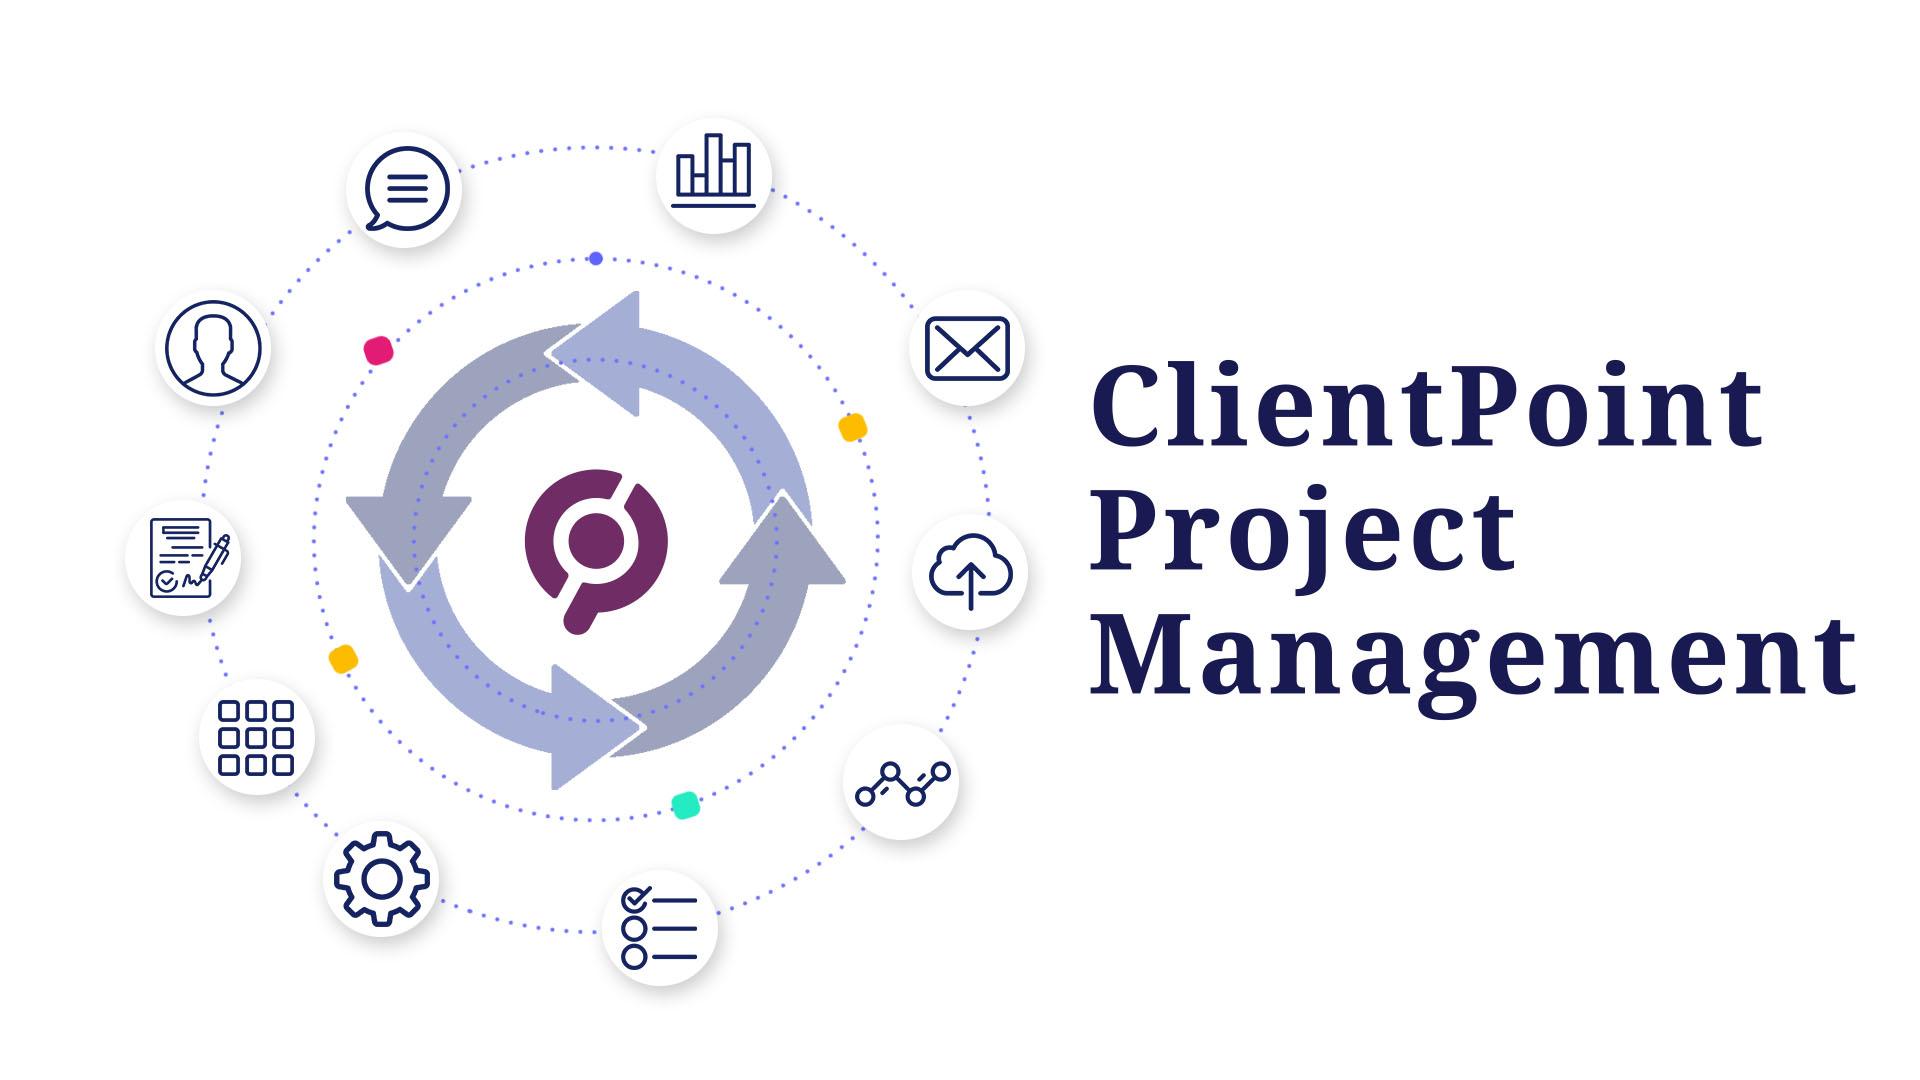 https://f.hubspotusercontent20.net/hubfs/5348071/ClientPoint%20Project%20Managment-1.jpg